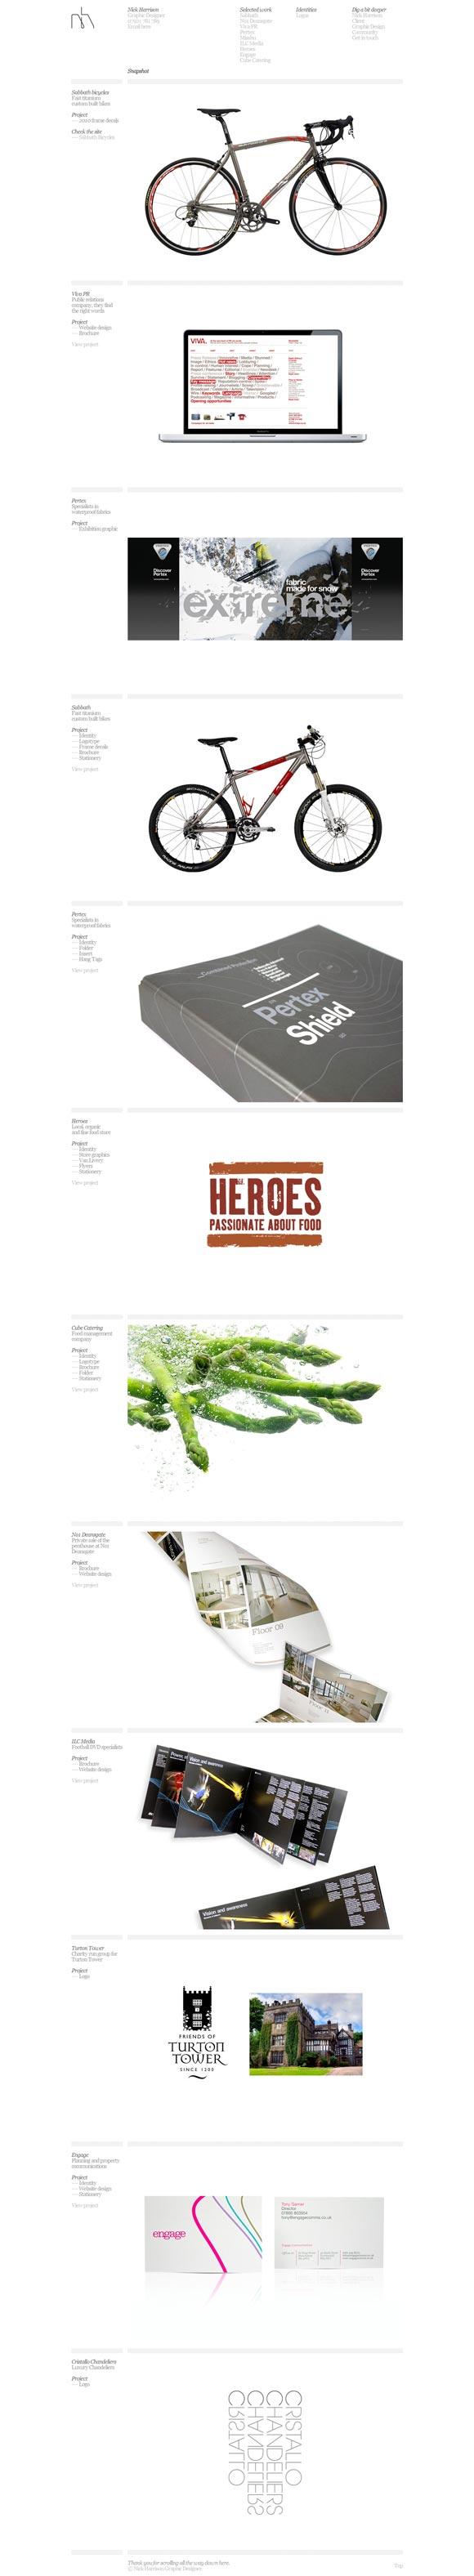 Nick Harrison | Graphic Designer